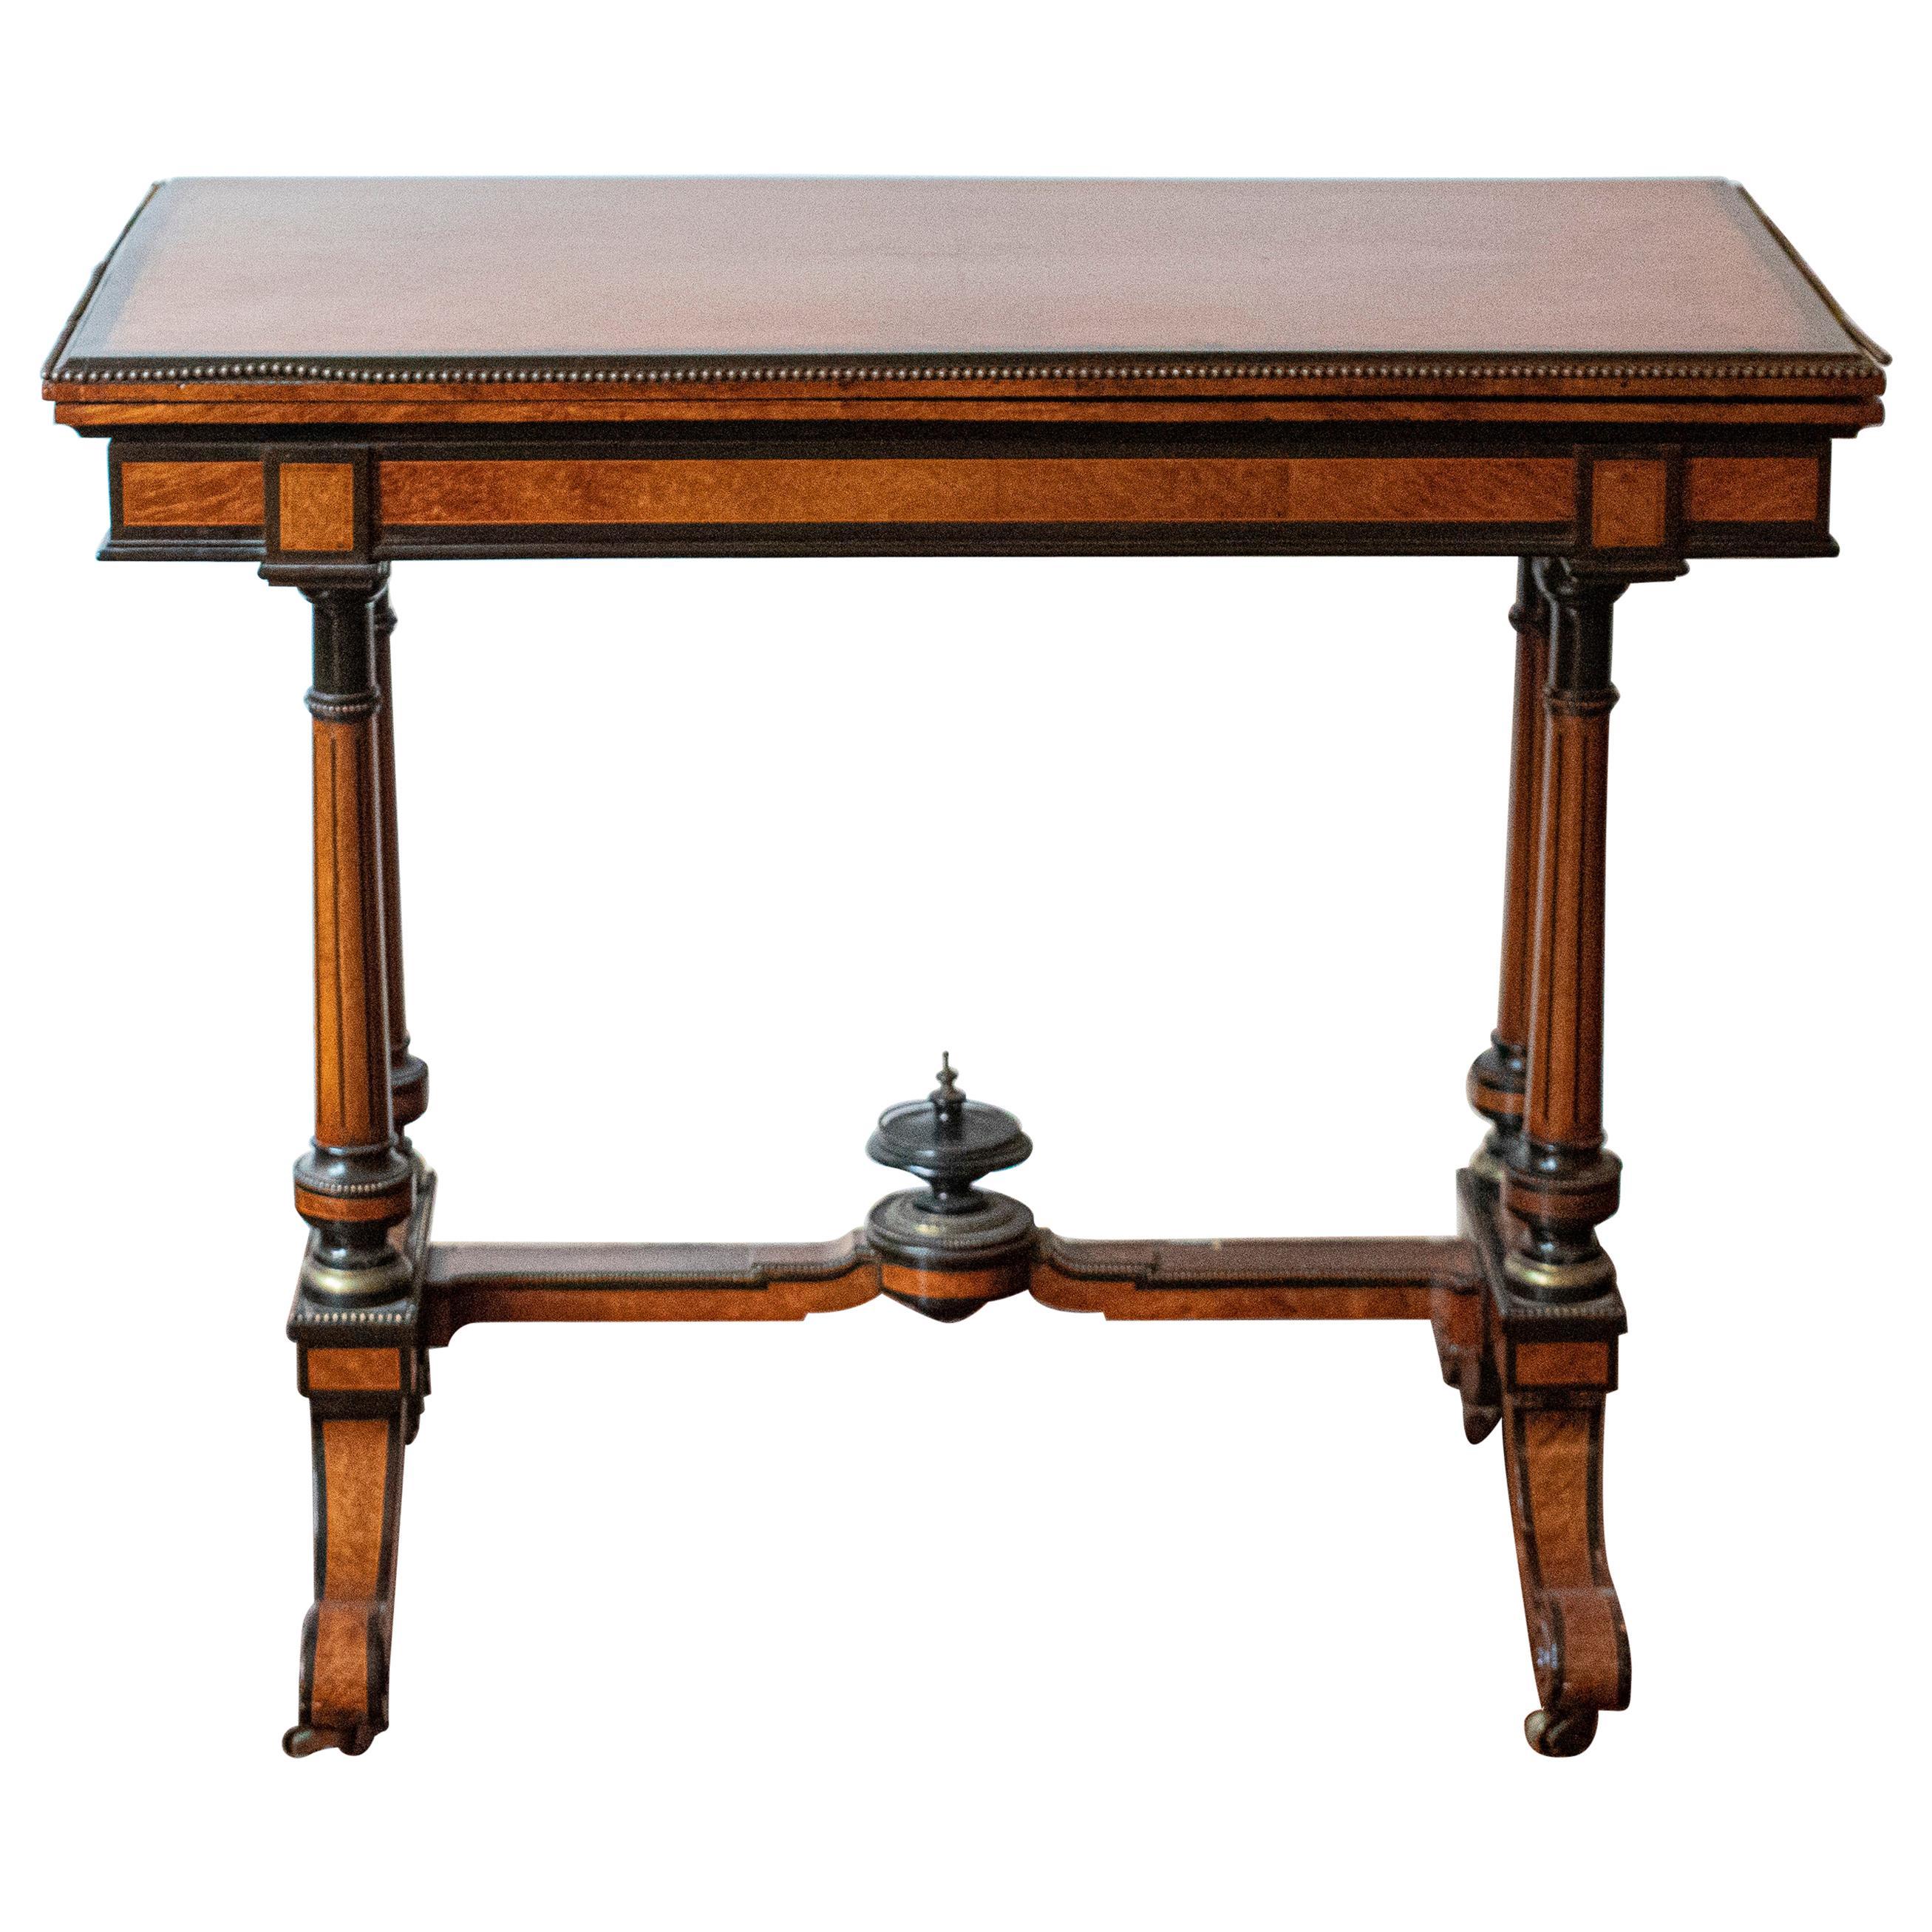 English Renaissance Revival Amboyna Wood Flip Top Card Table